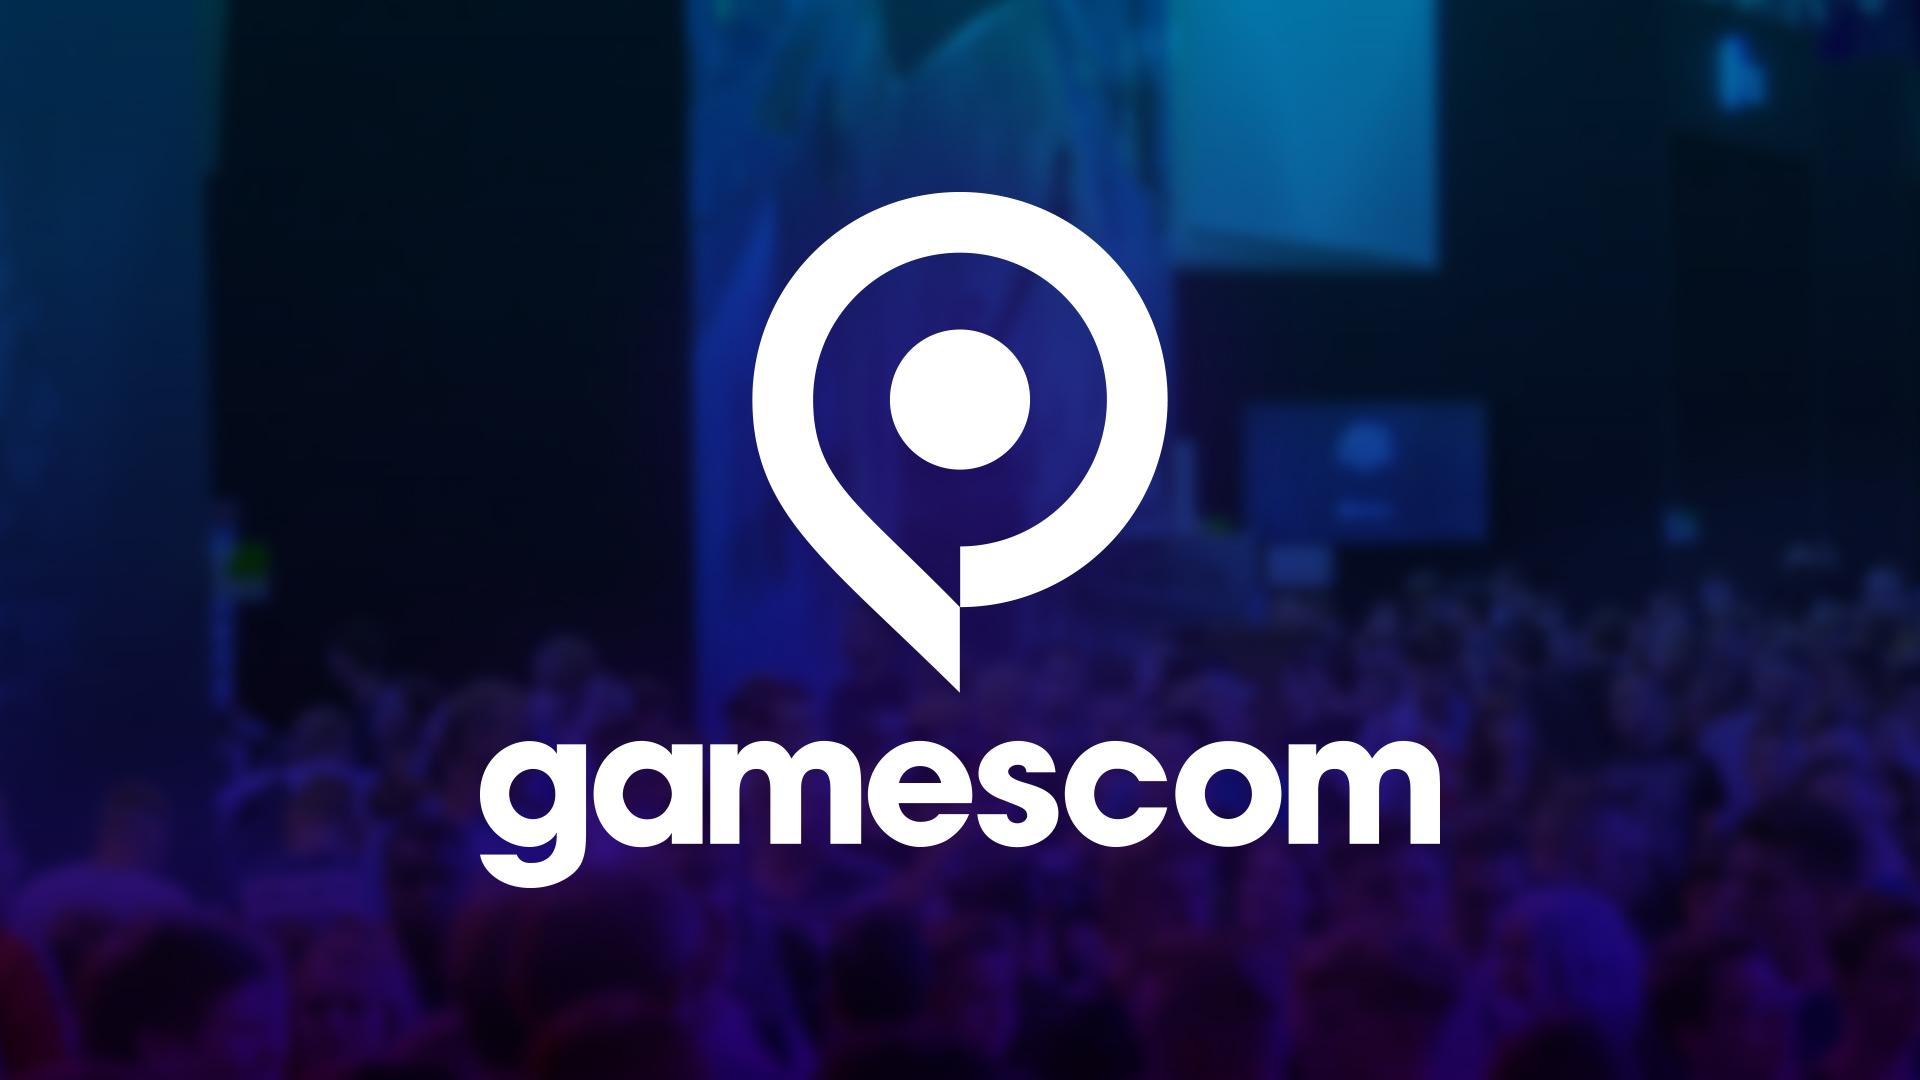 vgc gamescom crowd logo stacked